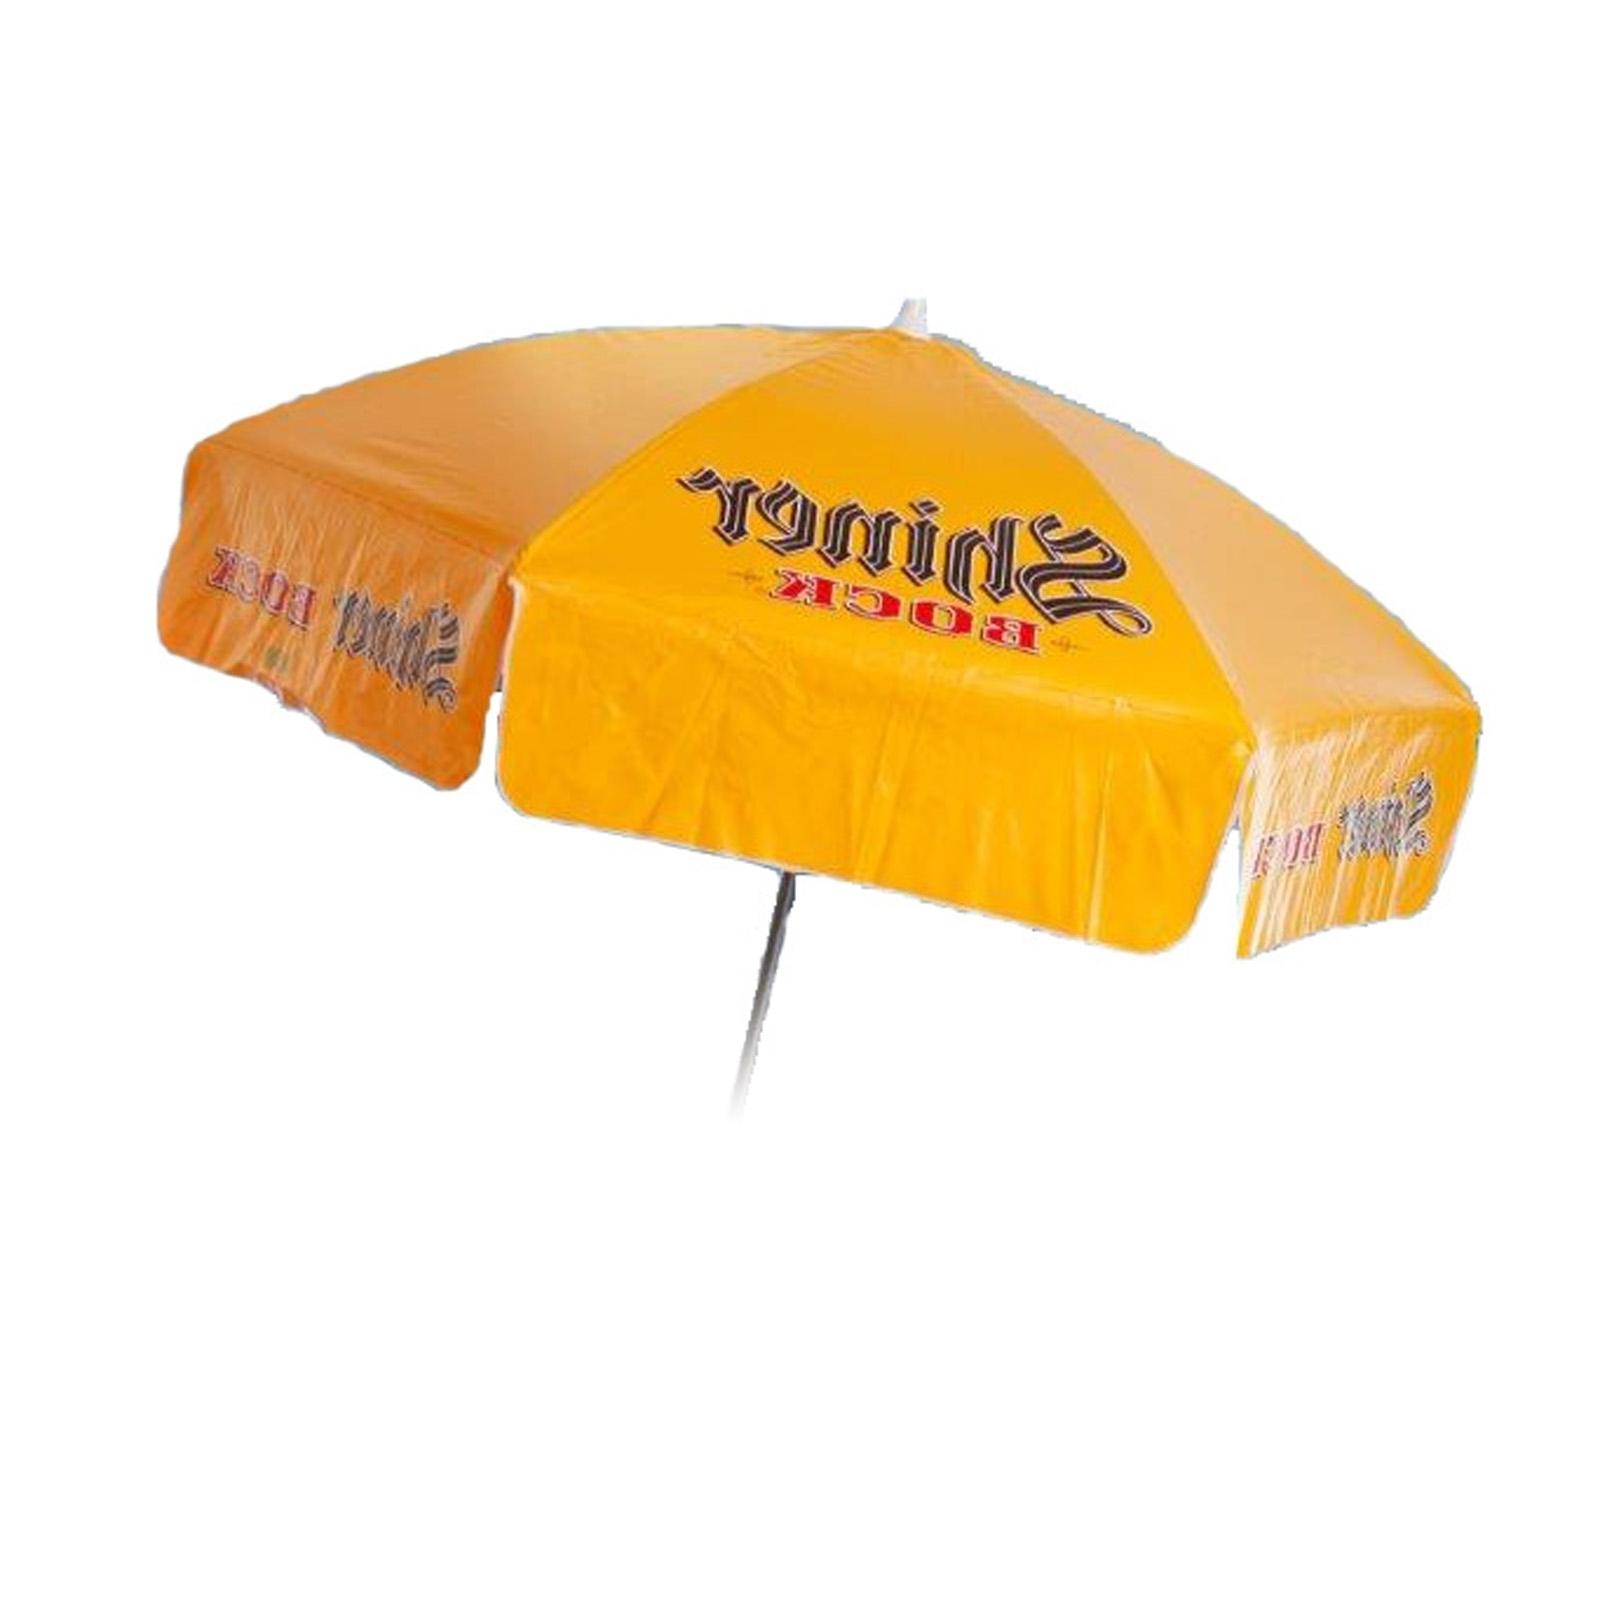 6 Foot Push Tilt Cinzano Vinyl Umbrella Patio Pole – Lawsonreport Throughout Recent Vinyl Patio Umbrellas (View 11 of 20)